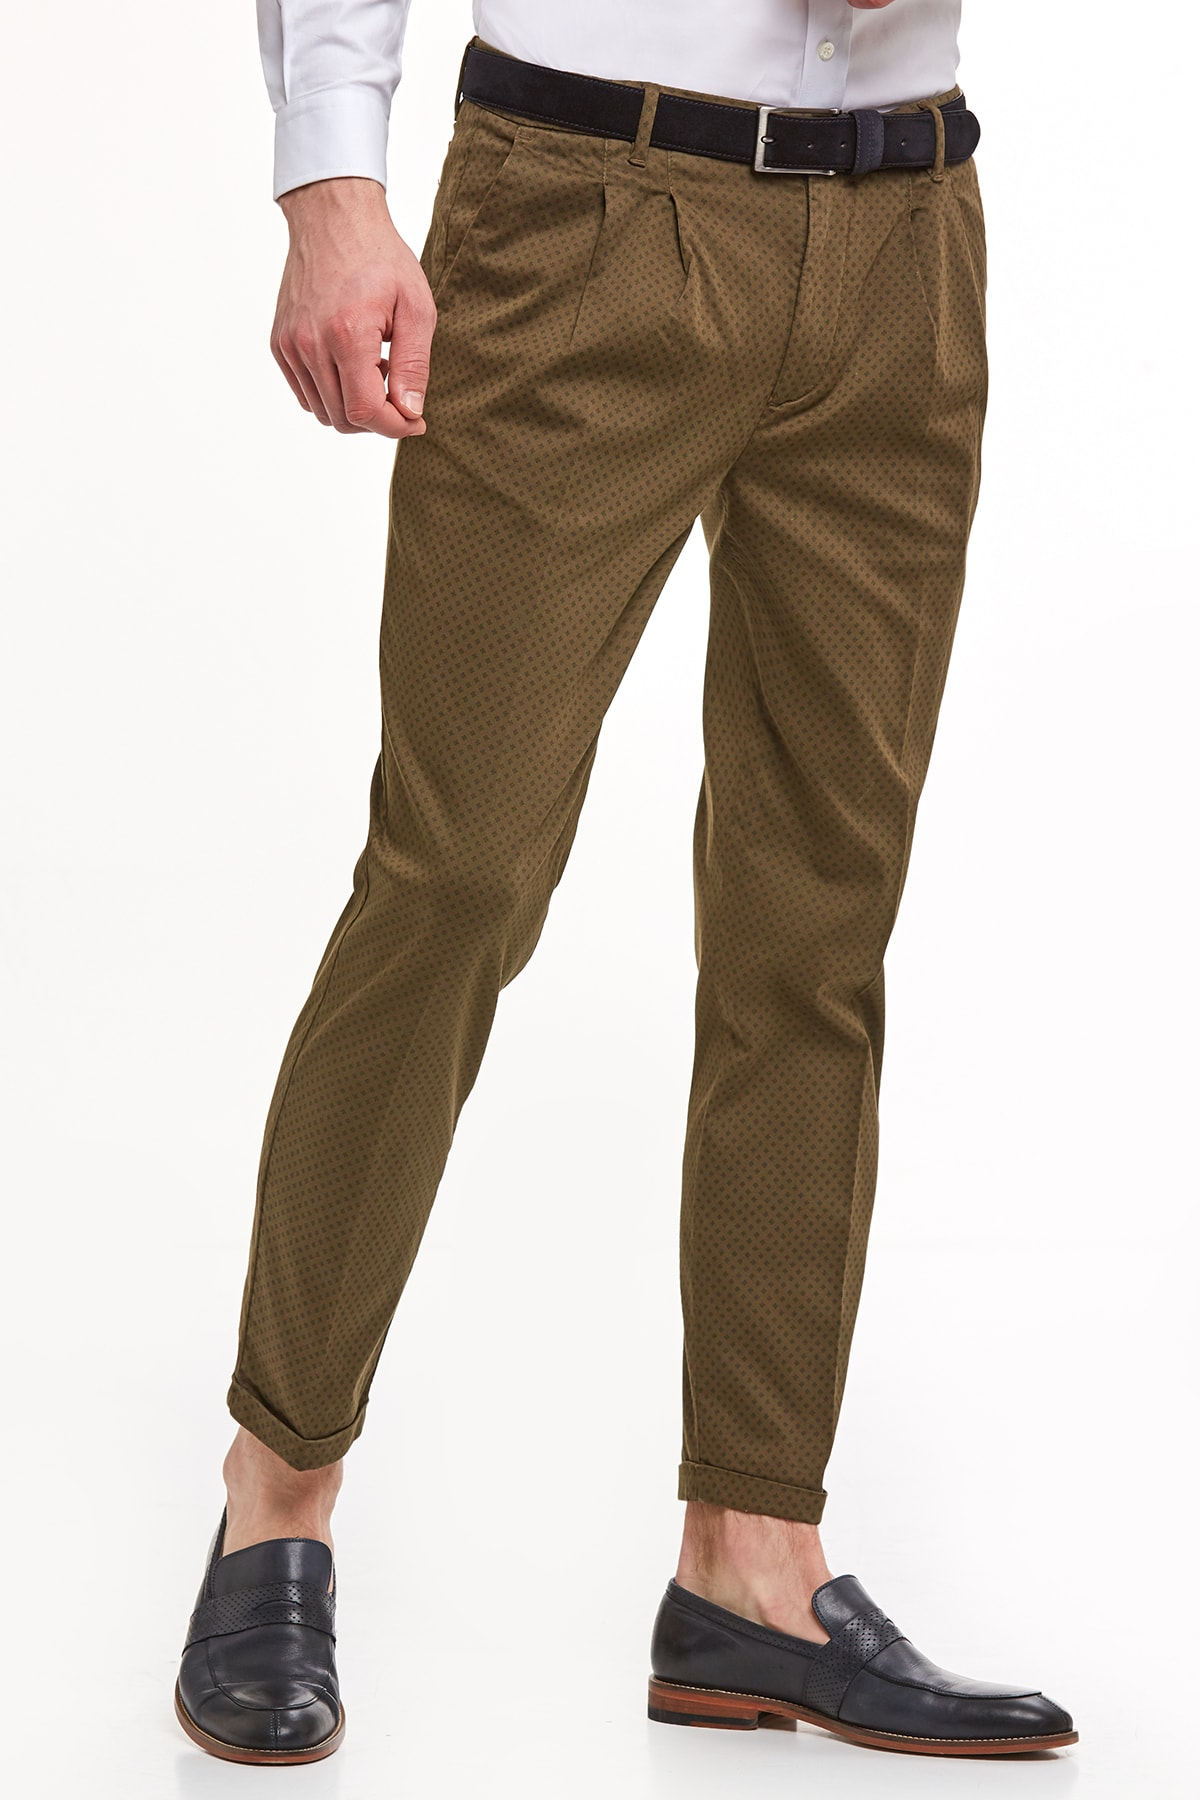 Hemington Haki Desenli Pamuk Chino Pantolon 1